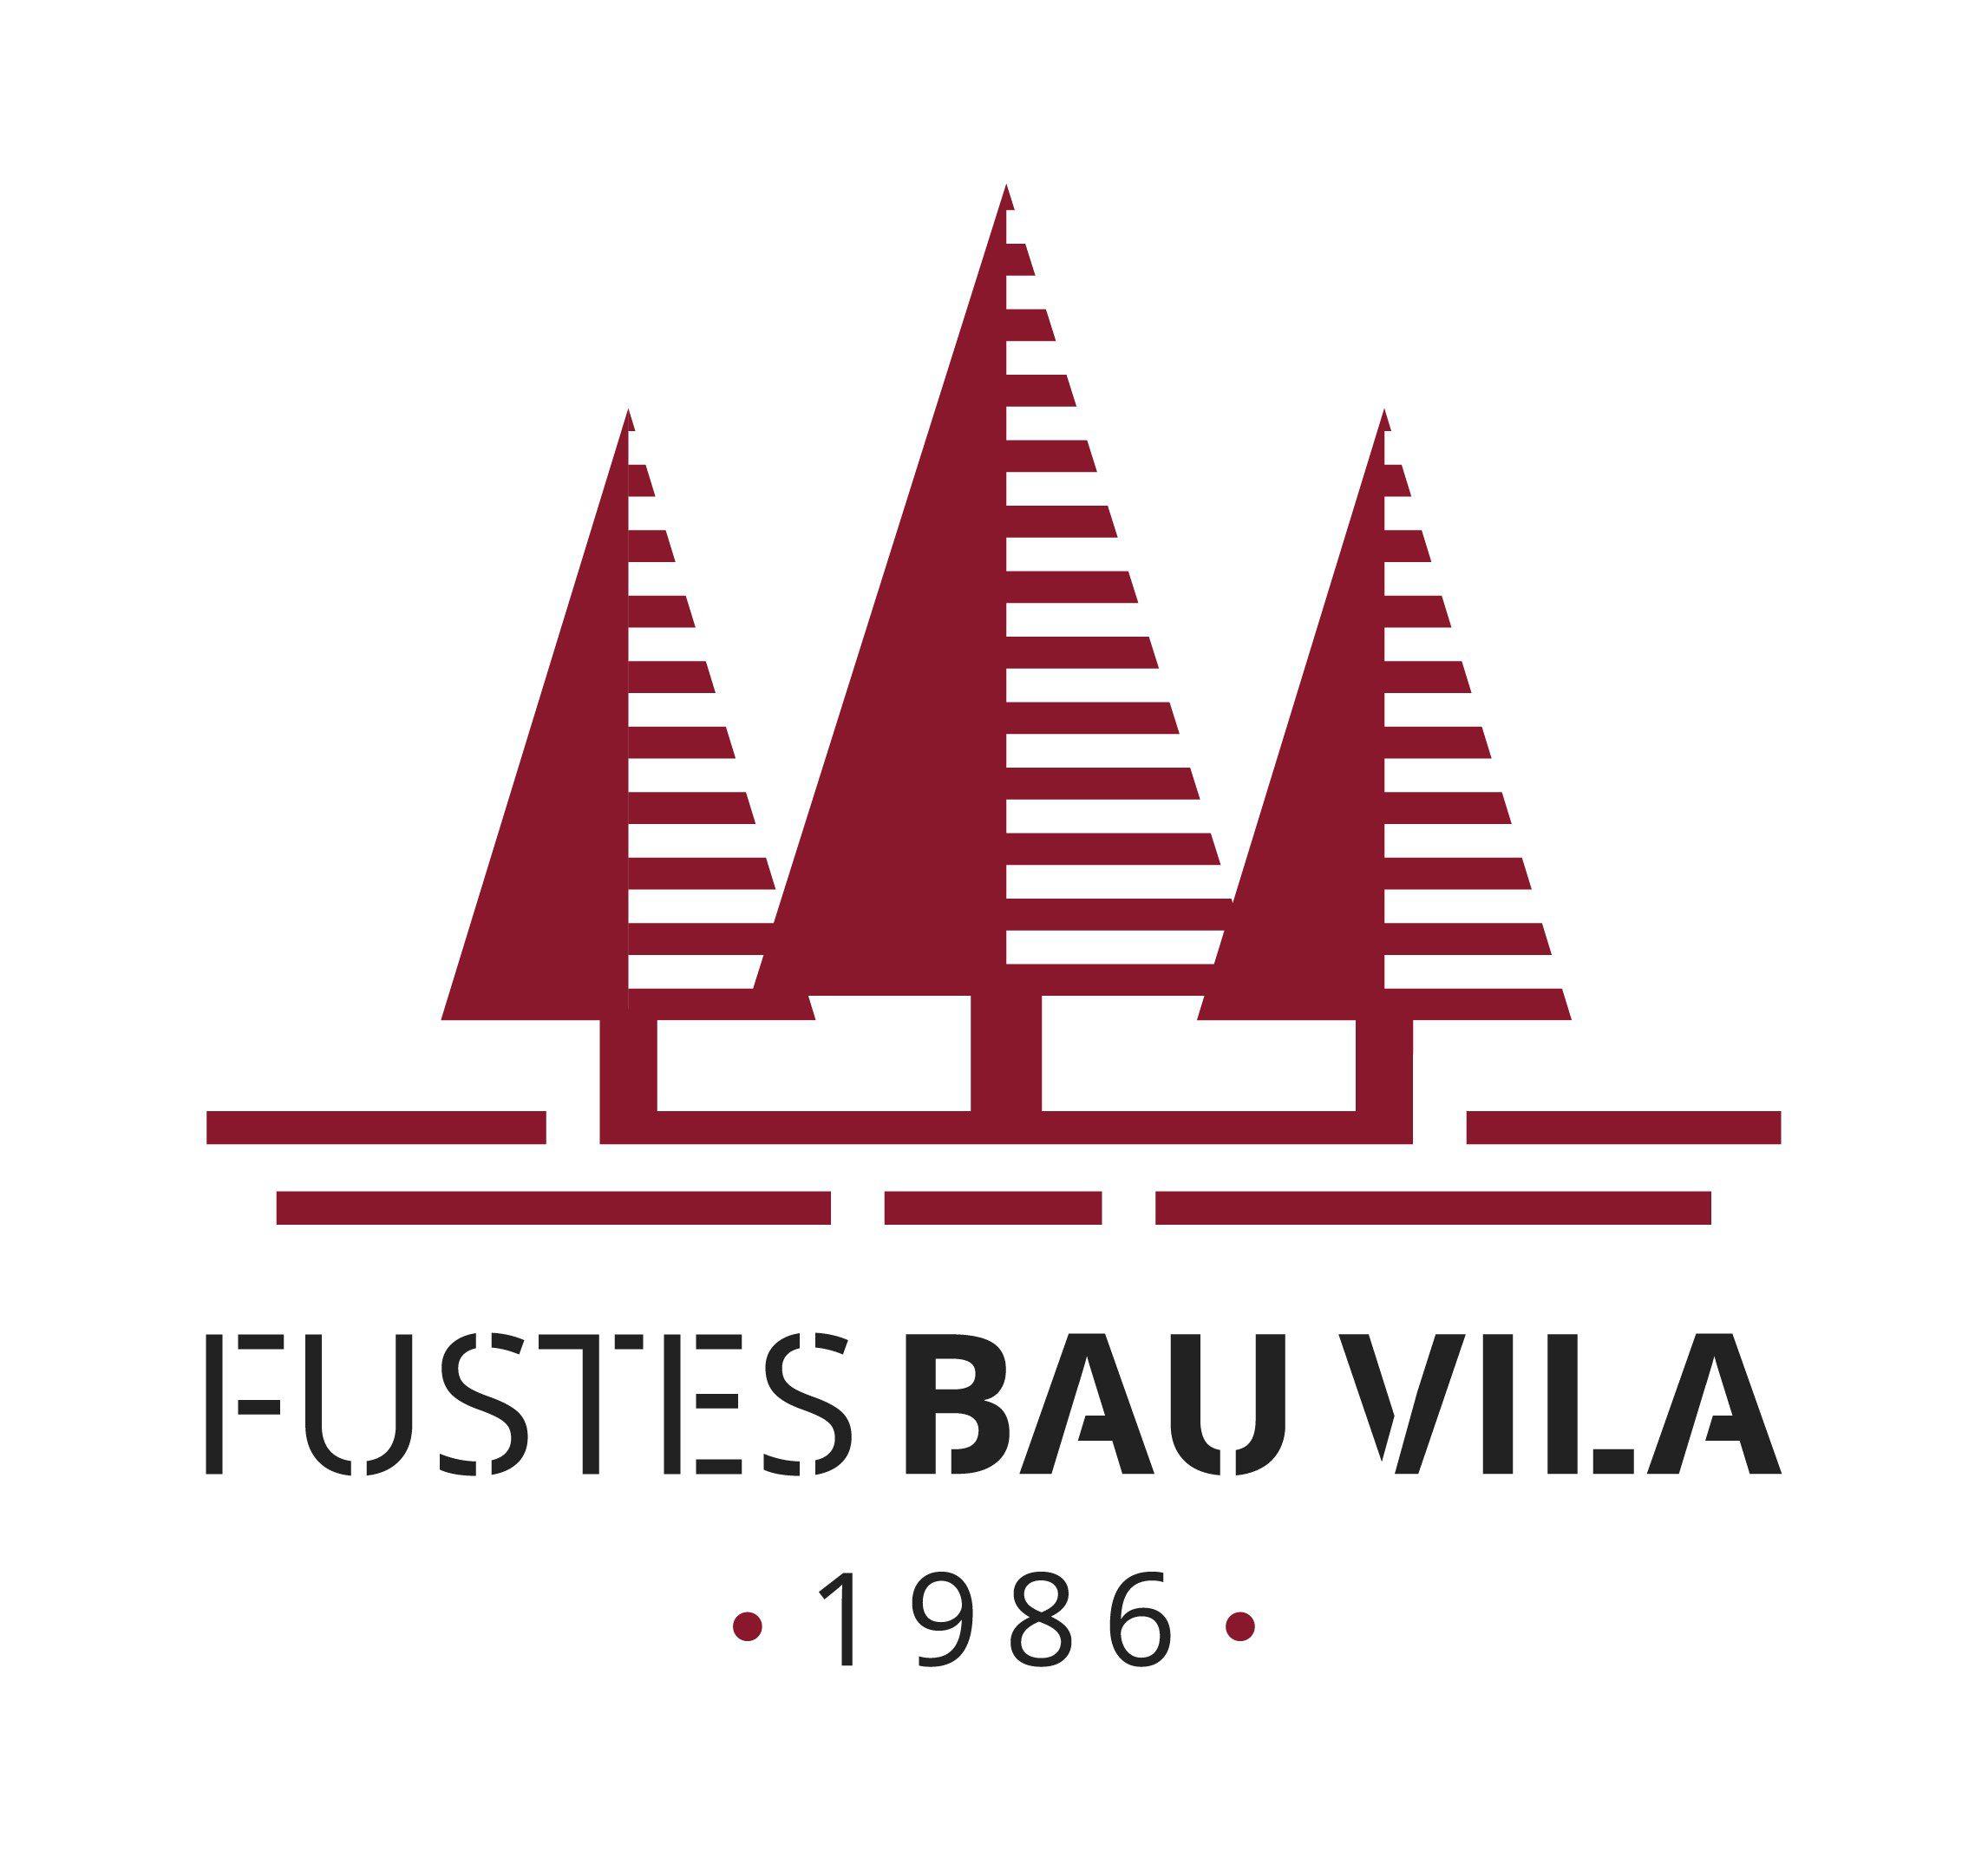 BauVila